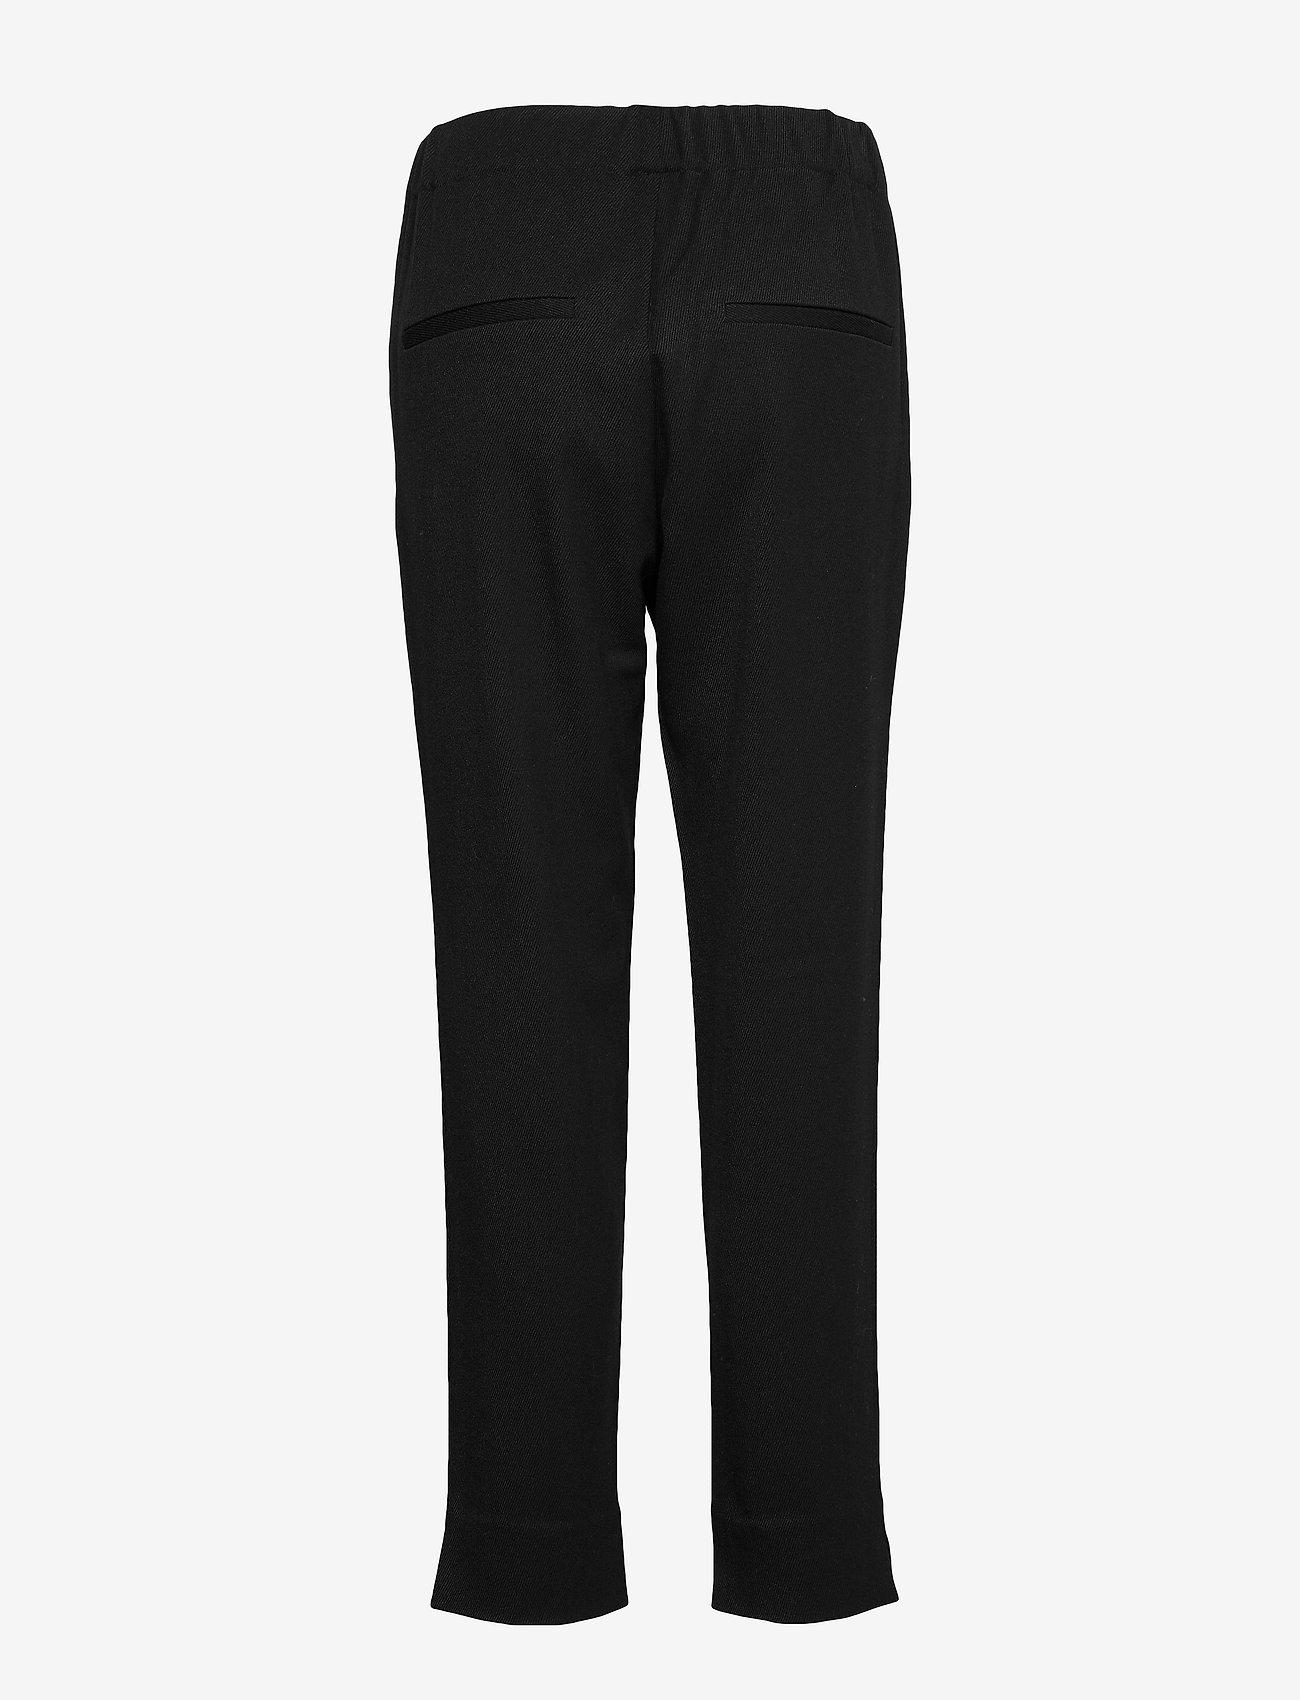 2NDDAY - 2ND Addie - straight leg trousers - black - 1